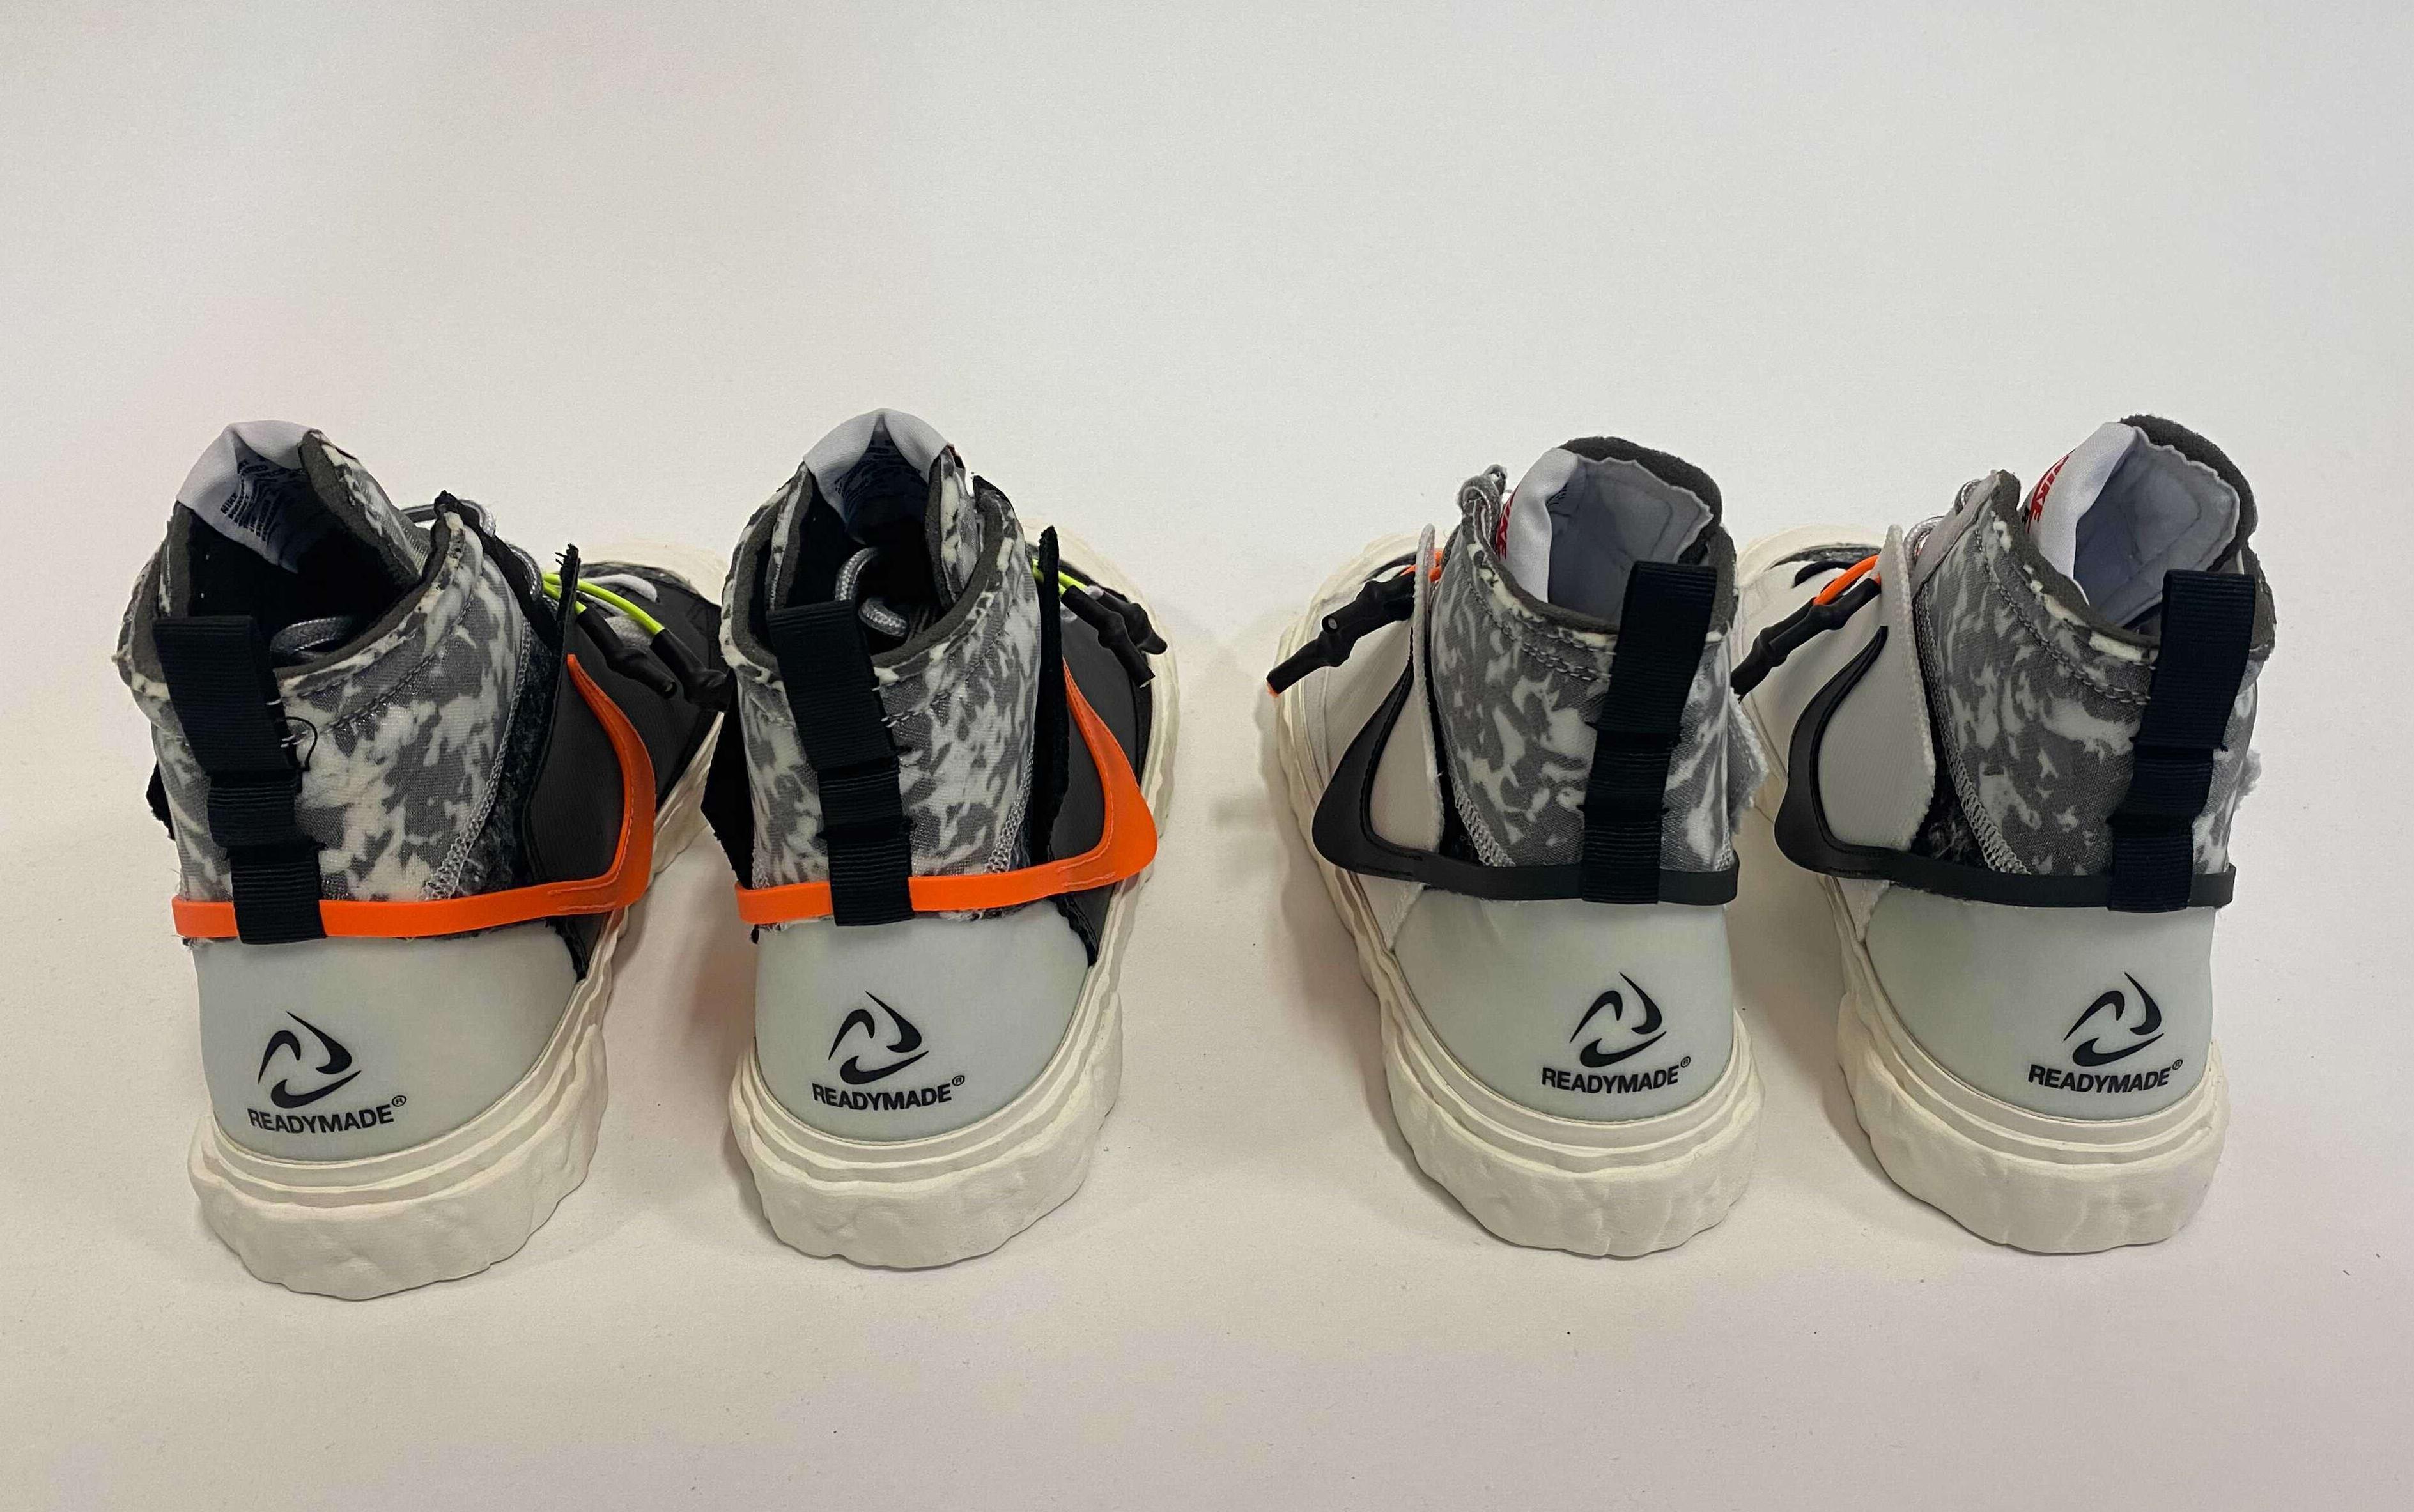 Readymade x Nike Blazer Mid (Group)